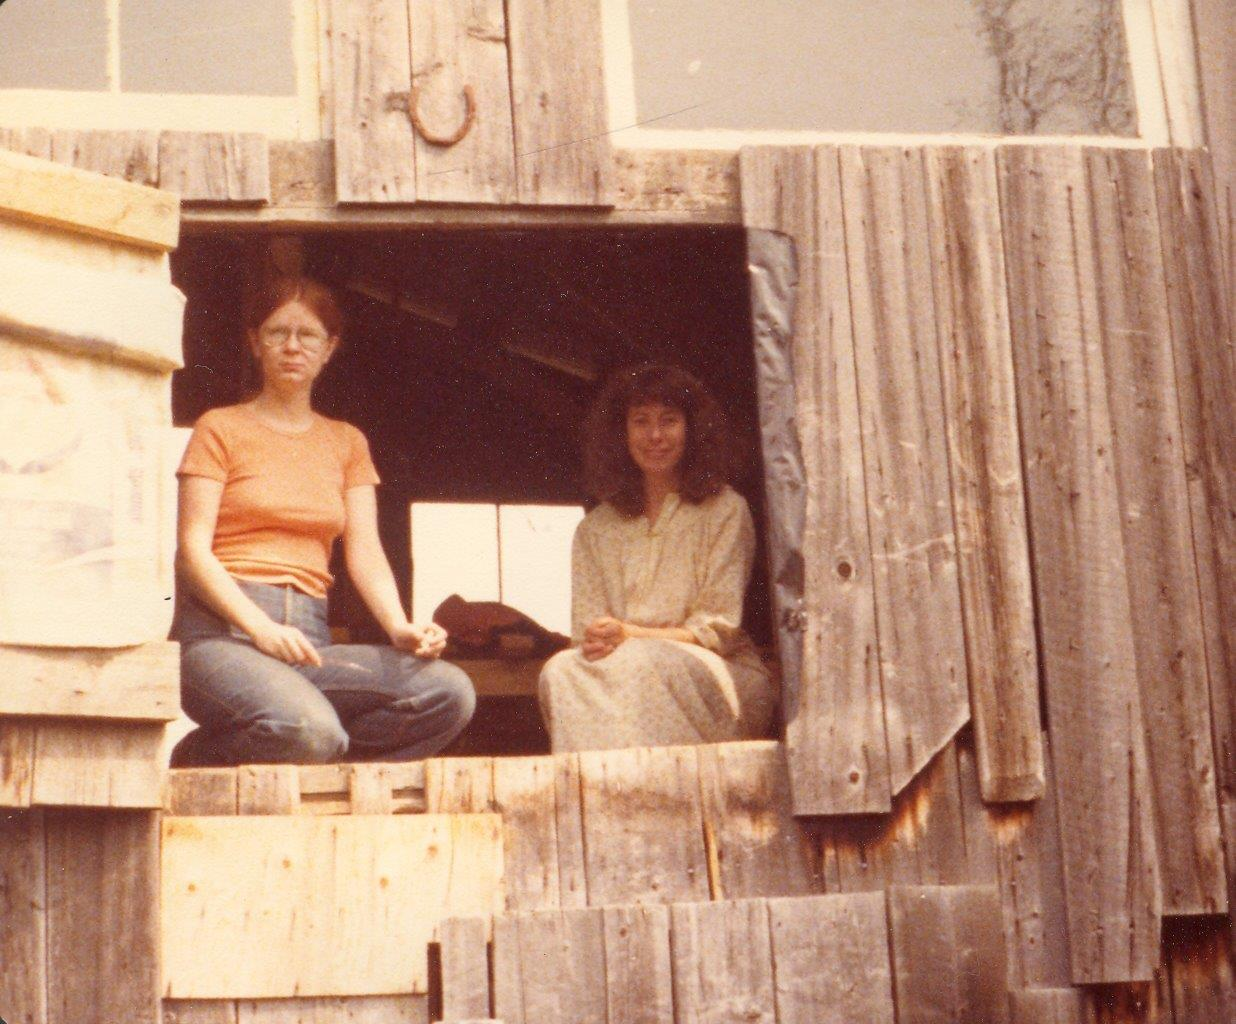 198005xx-ra-004-Barb + Nanci At Barn-Randboro